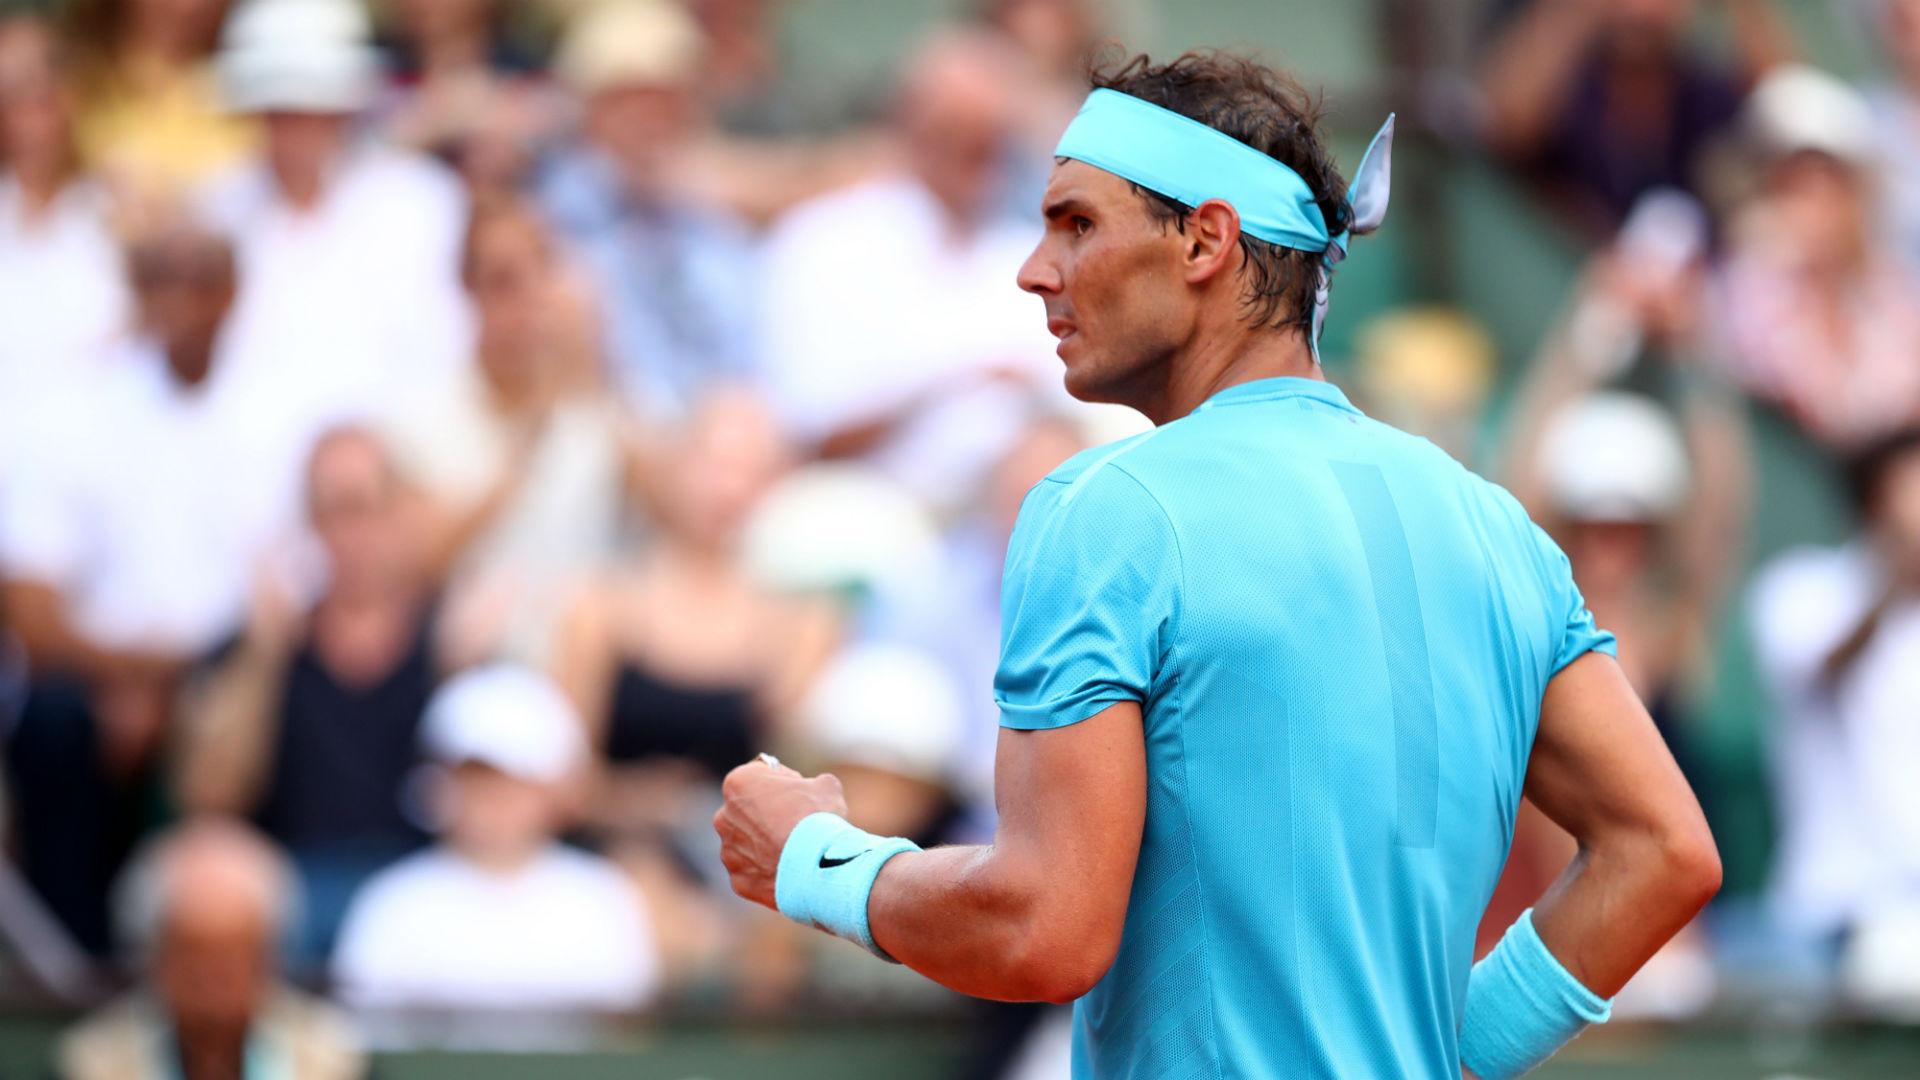 French Open 2018 men's final: Recapping Rafael Nadal's ...